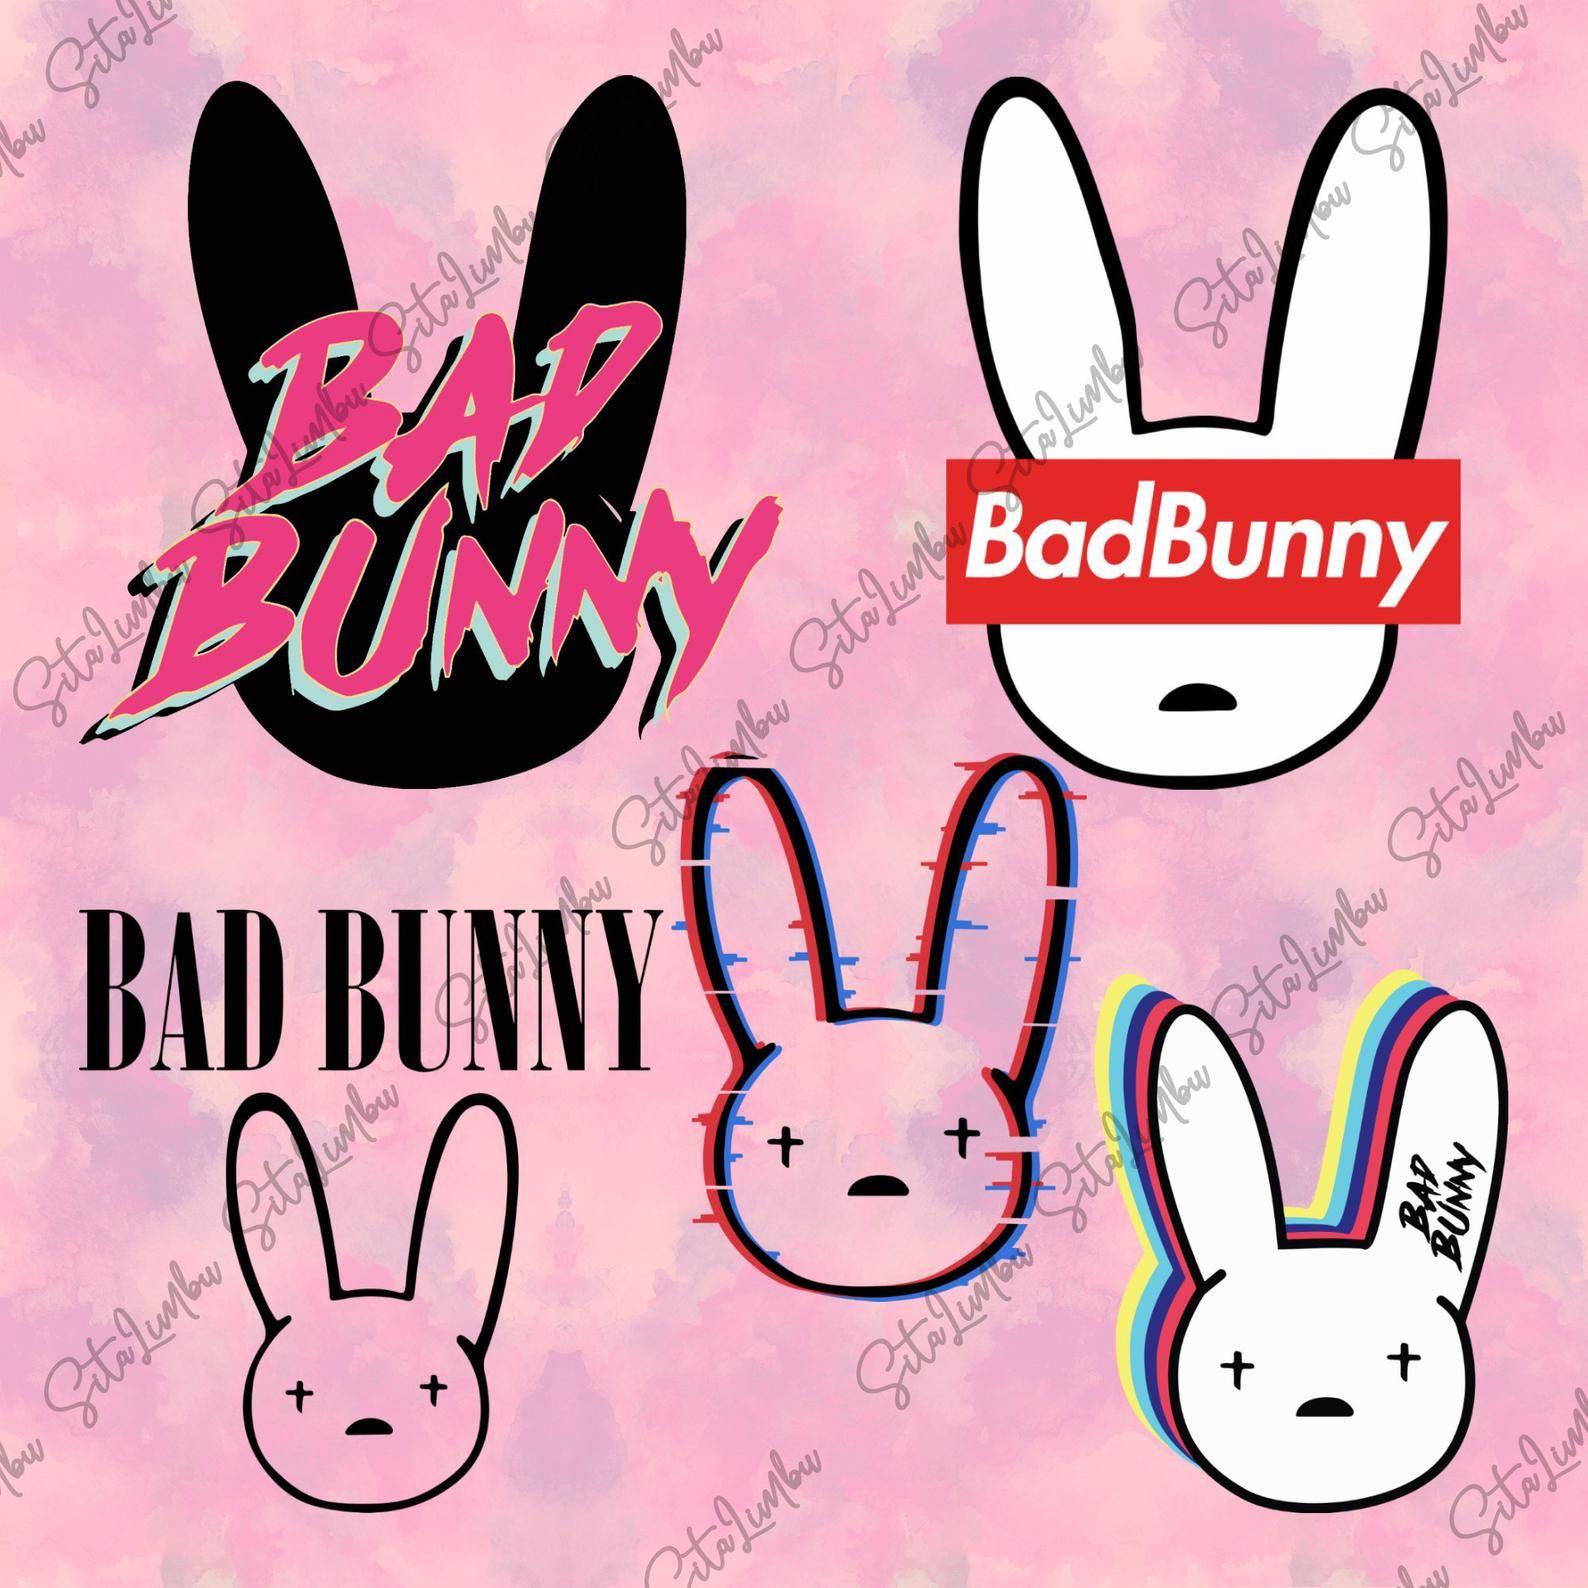 Bad Bunny Svg File Bab Bunny Bundle Bad Bunny Logo Svg Files For Cricut Dxf Eps Png Bunny Poster Bunny Svg Bunny Wallpaper